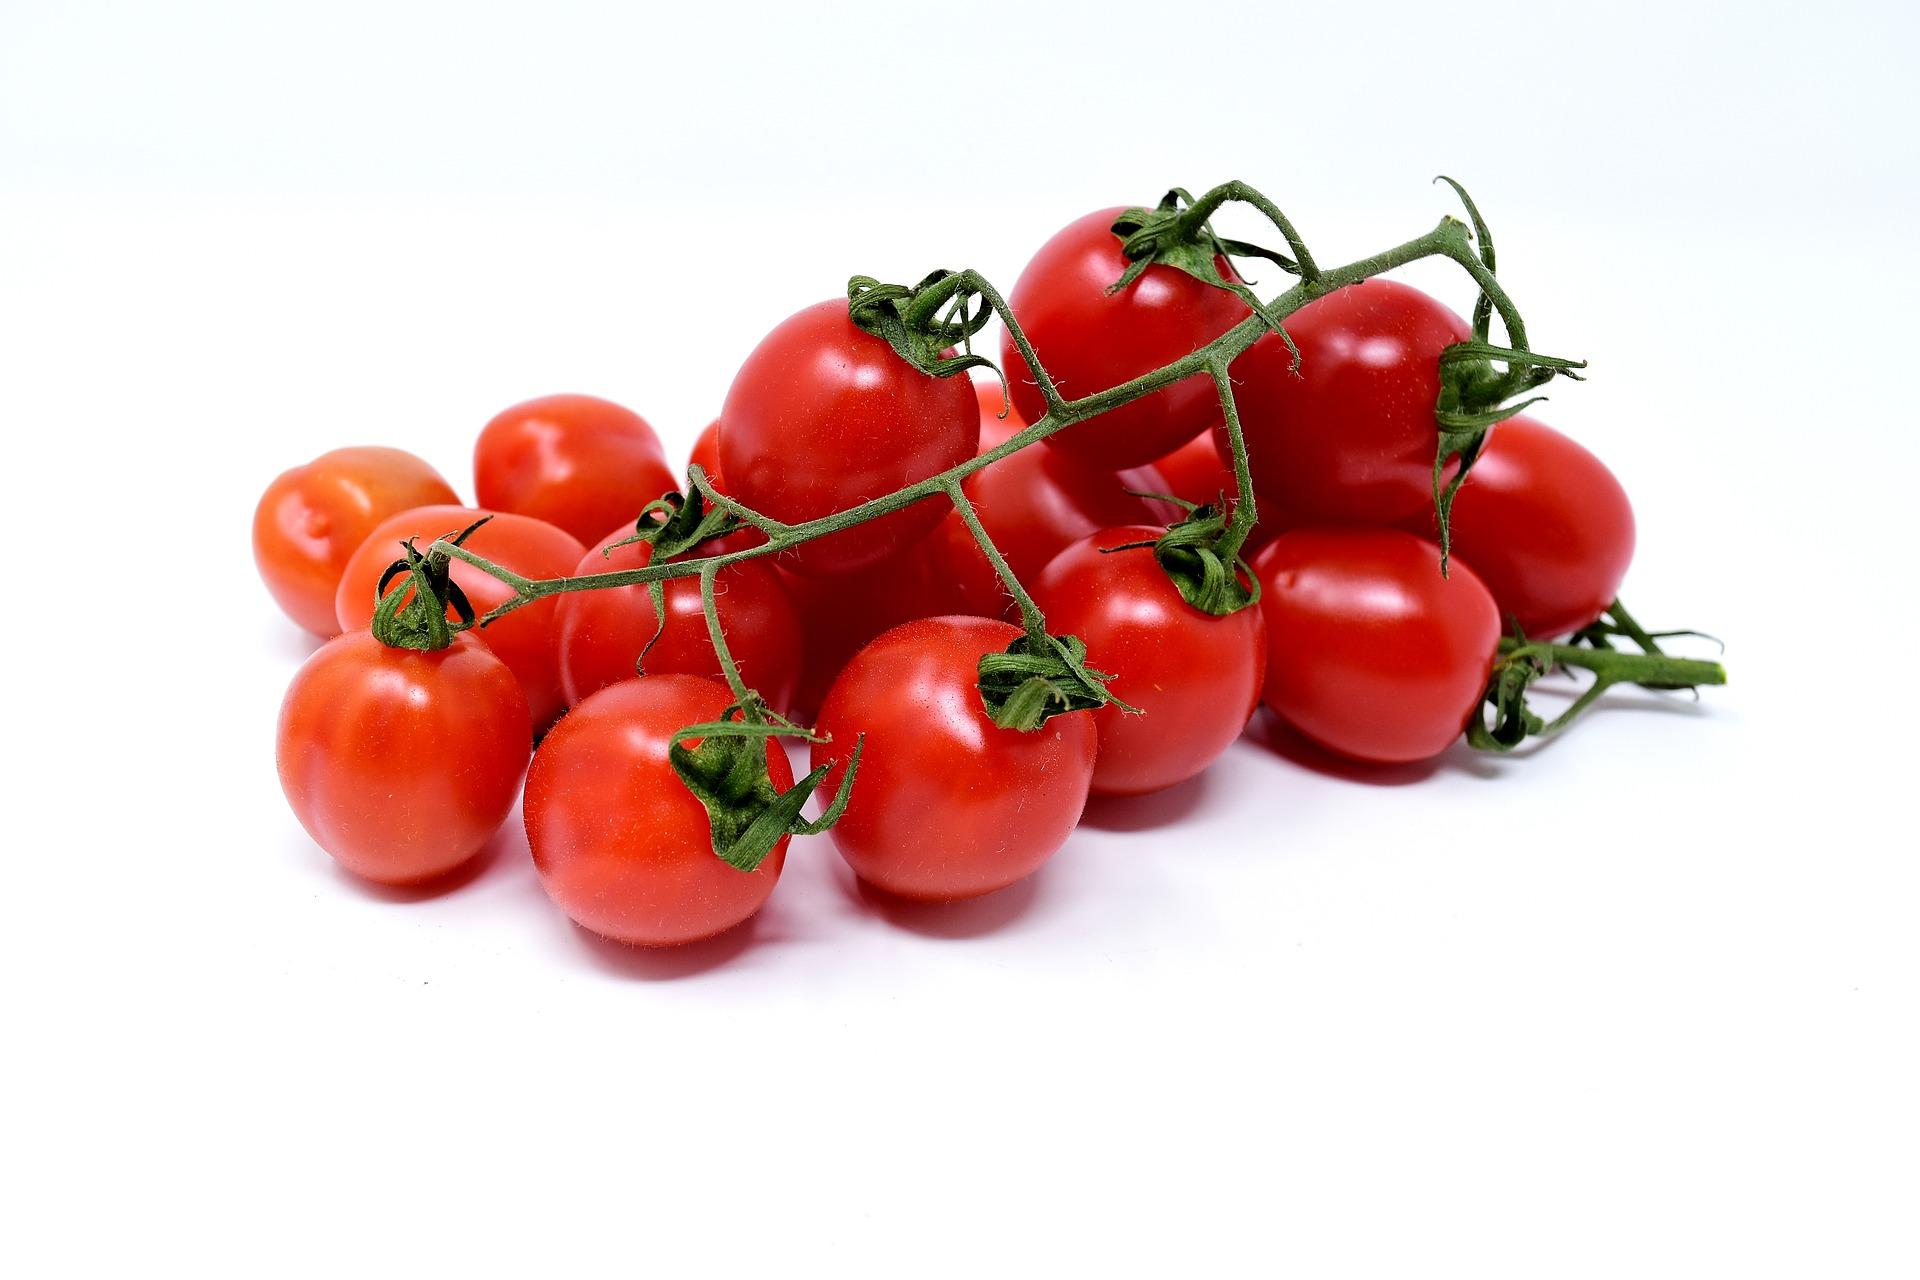 http://m.wm.pl/2018/04/orig/tomatoes-3121960-1920-460339.jpg